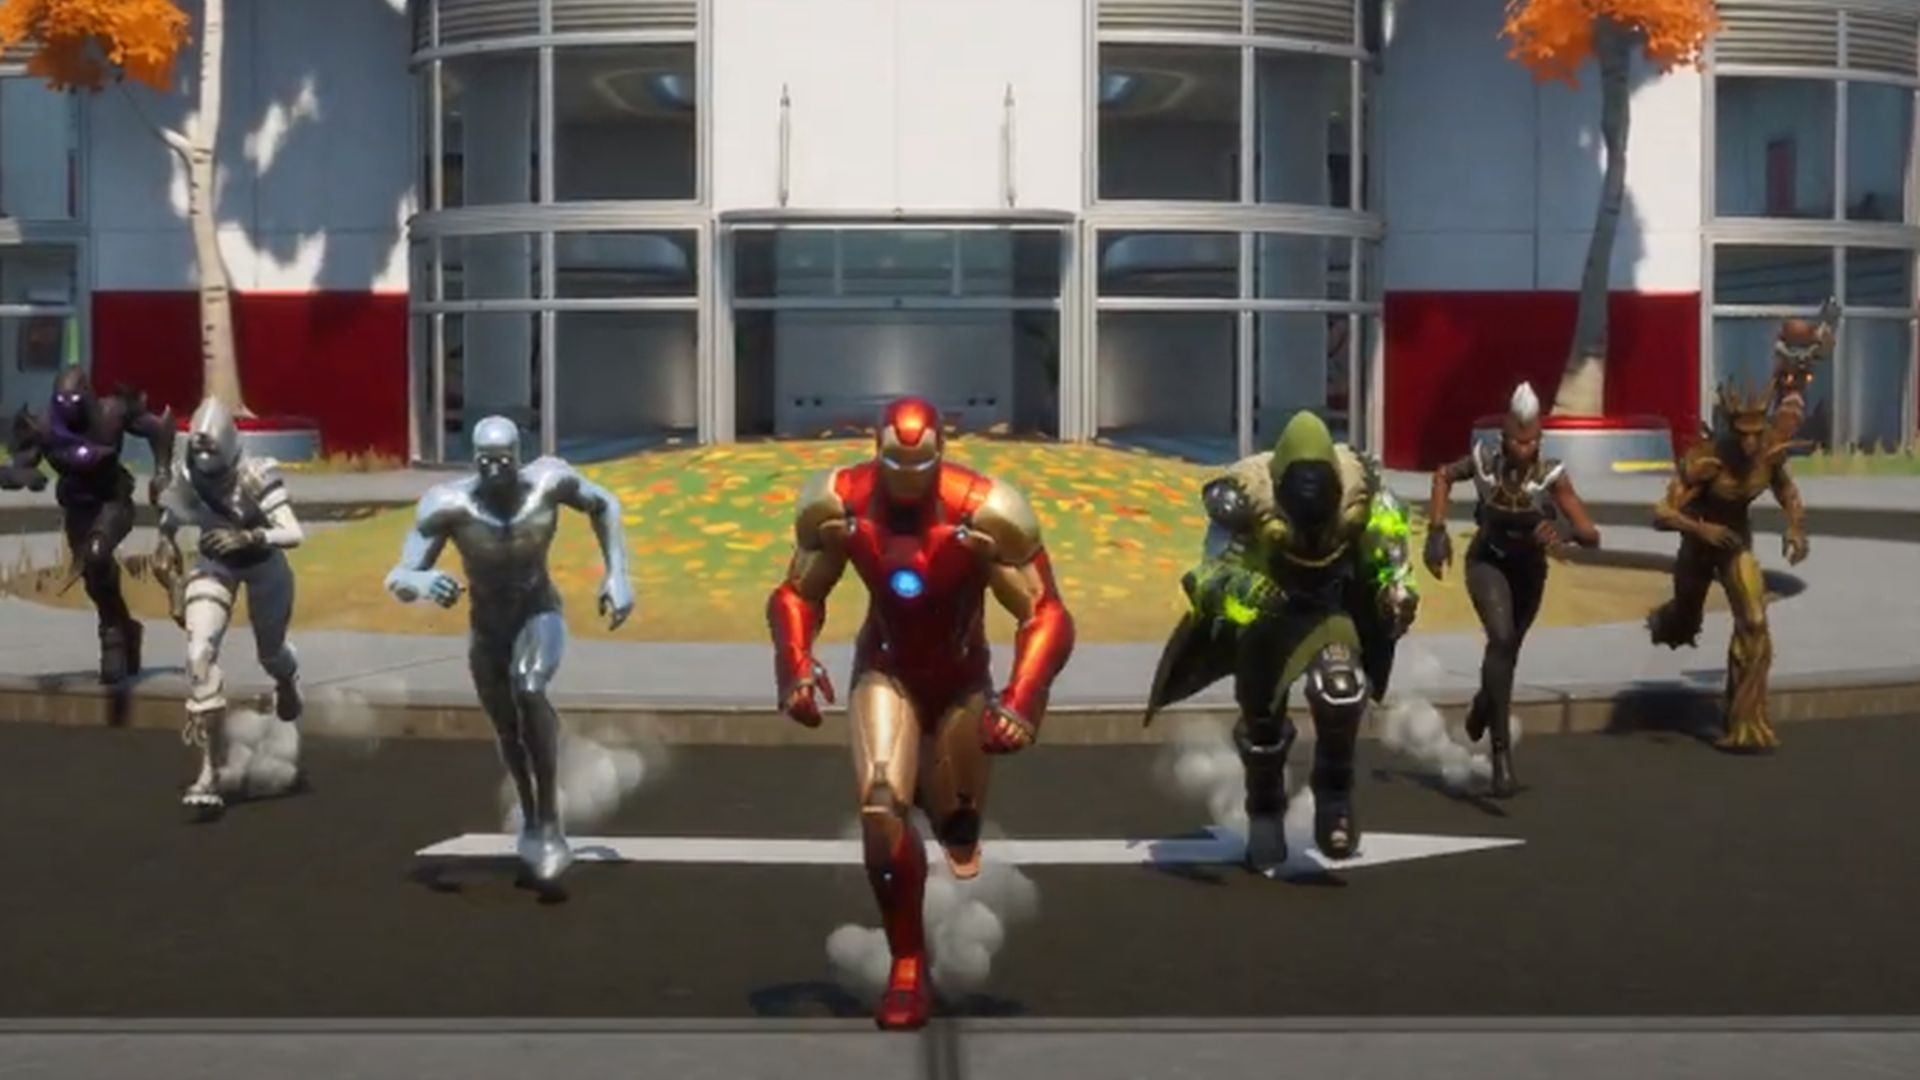 Fortnite Patch Notes Jetpacks Return Courtesy Of Stark Industries And New Bonus Challenges Arrive Gamesradar